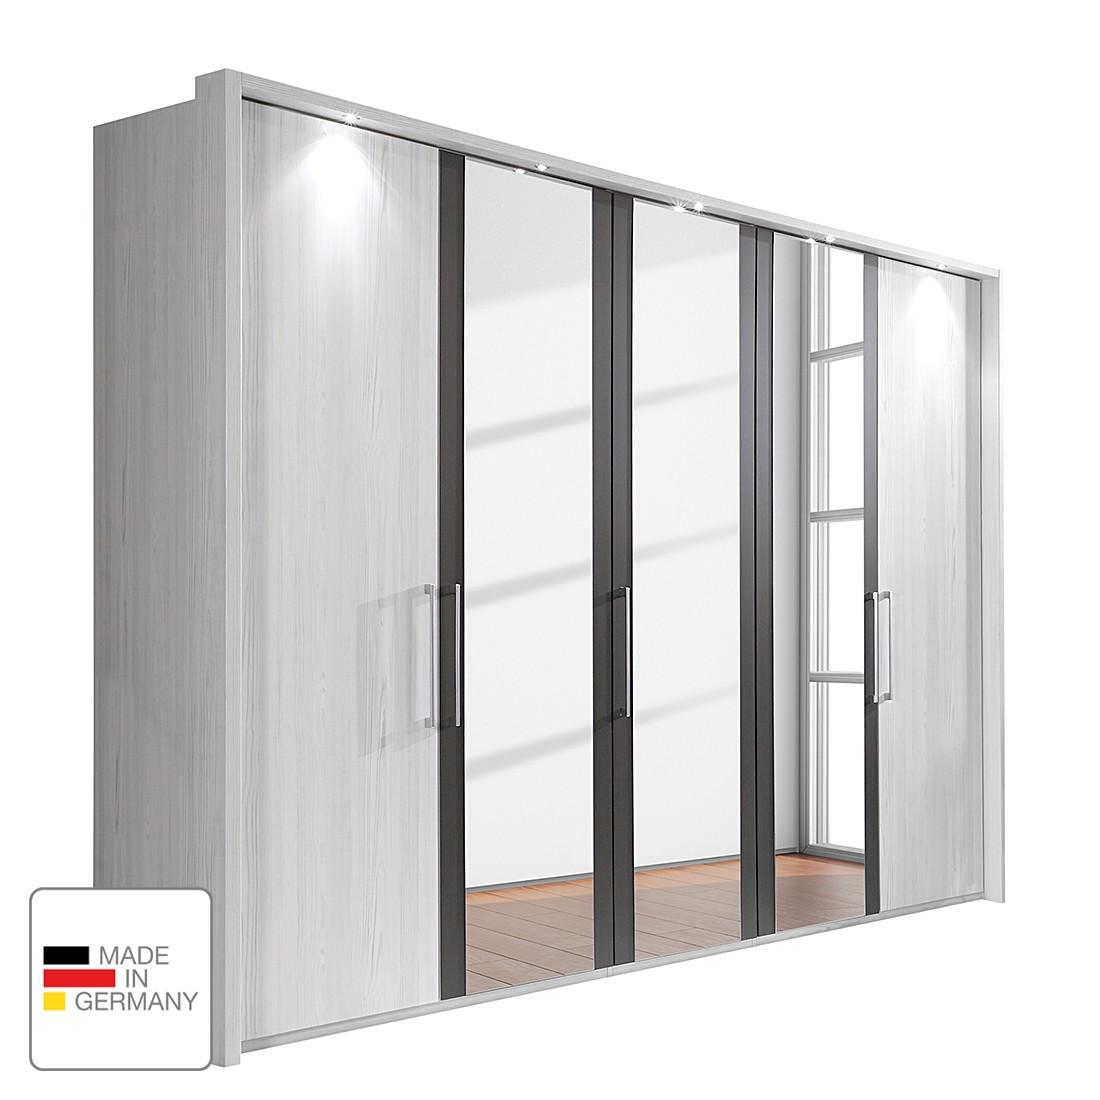 energie  A+, Draaideurkast Lissabon - Polar larikshouten look/Havanna - 400cm (8-deurs) - 2 spiegeldeuren - Met verlichte Passe-partout lijst, Wiemann